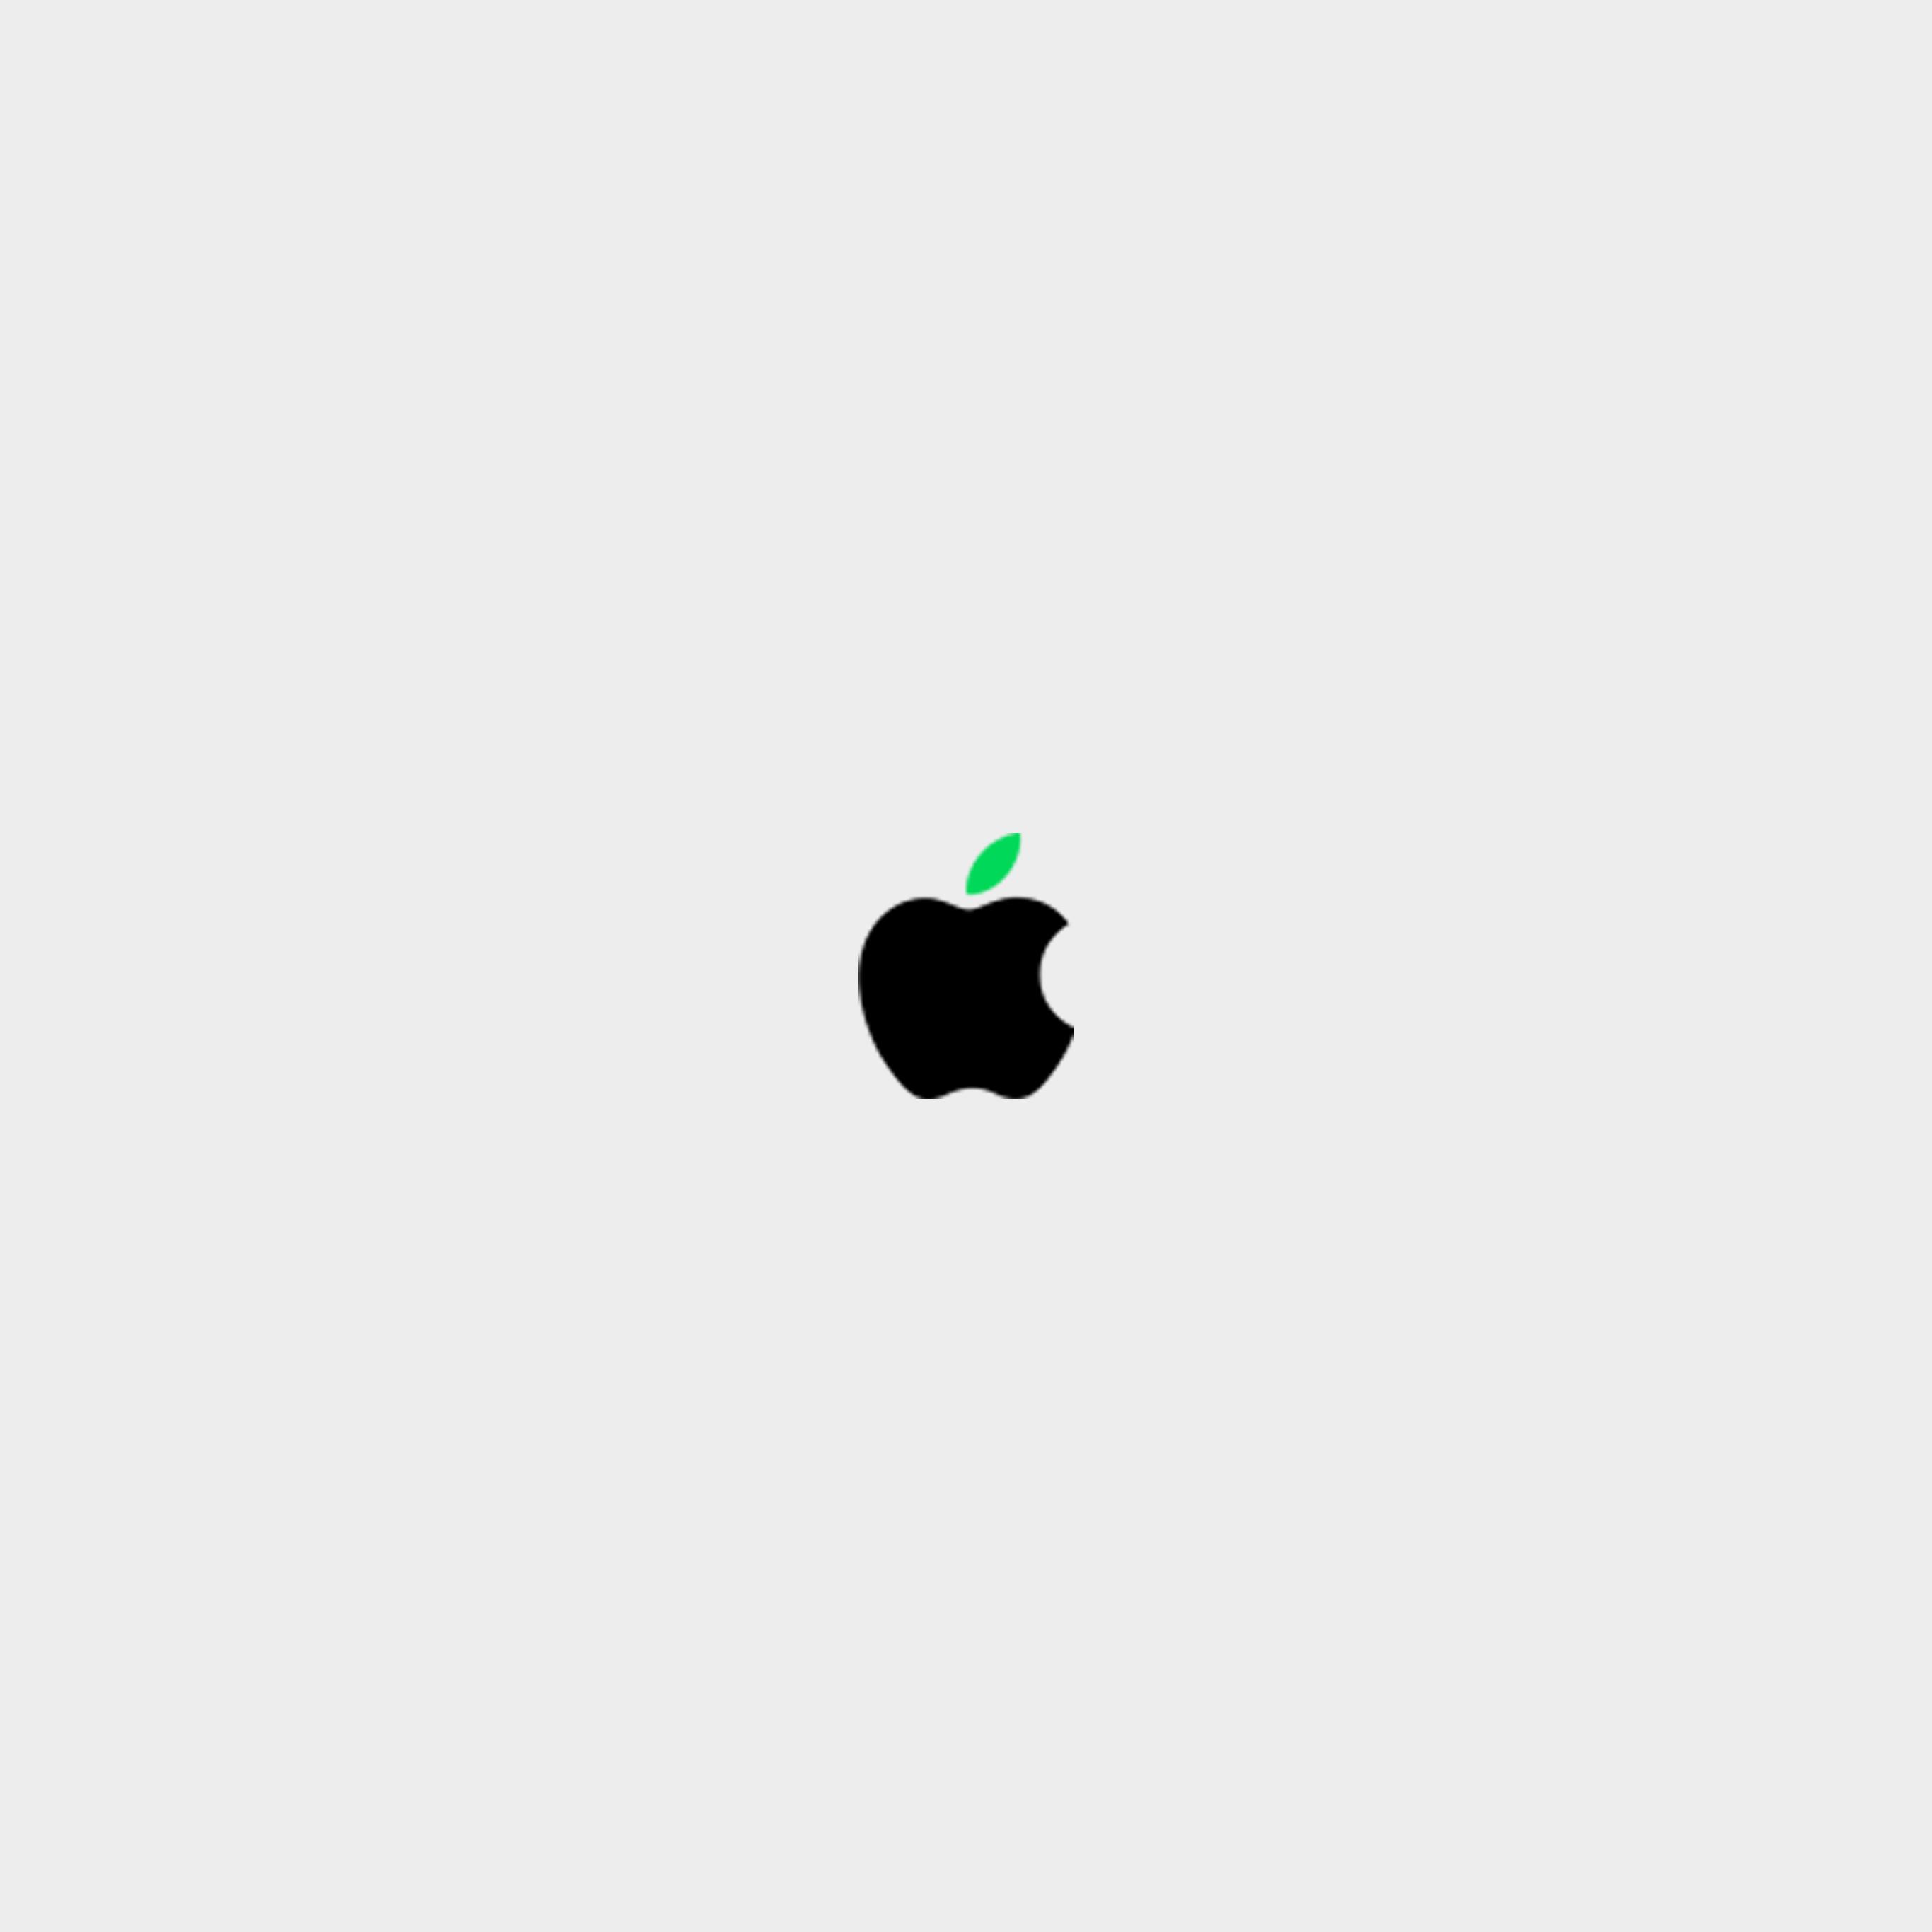 Apple earth day 2021 iPad Pro Wallpaper Apple Logo